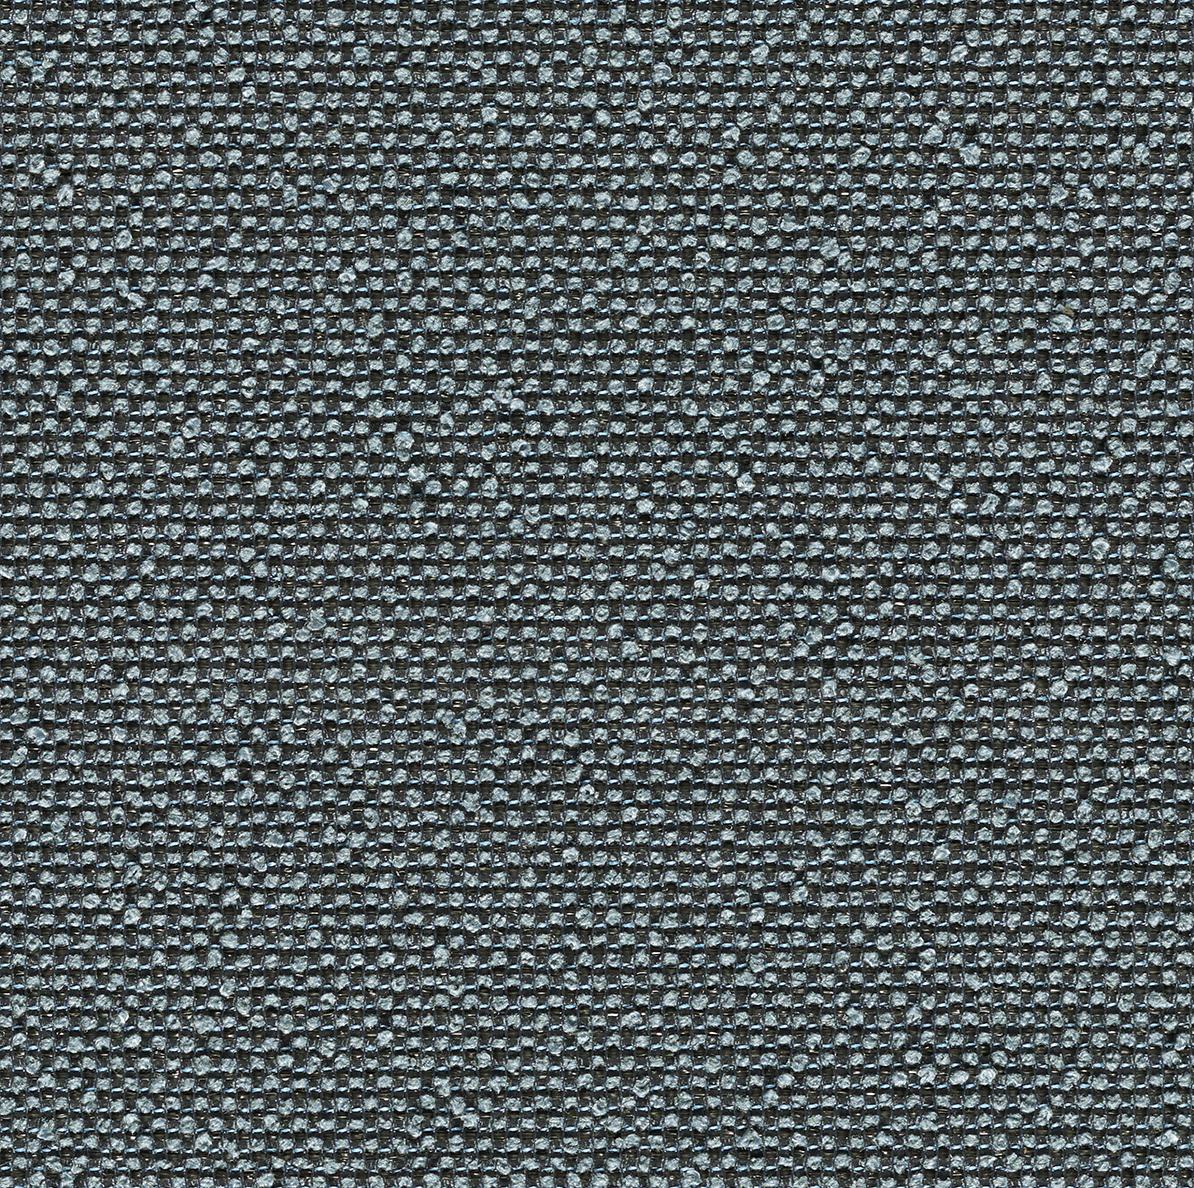 Rhetoric - Logos - 7017 - 05 - Half Yard Tileable Swatches